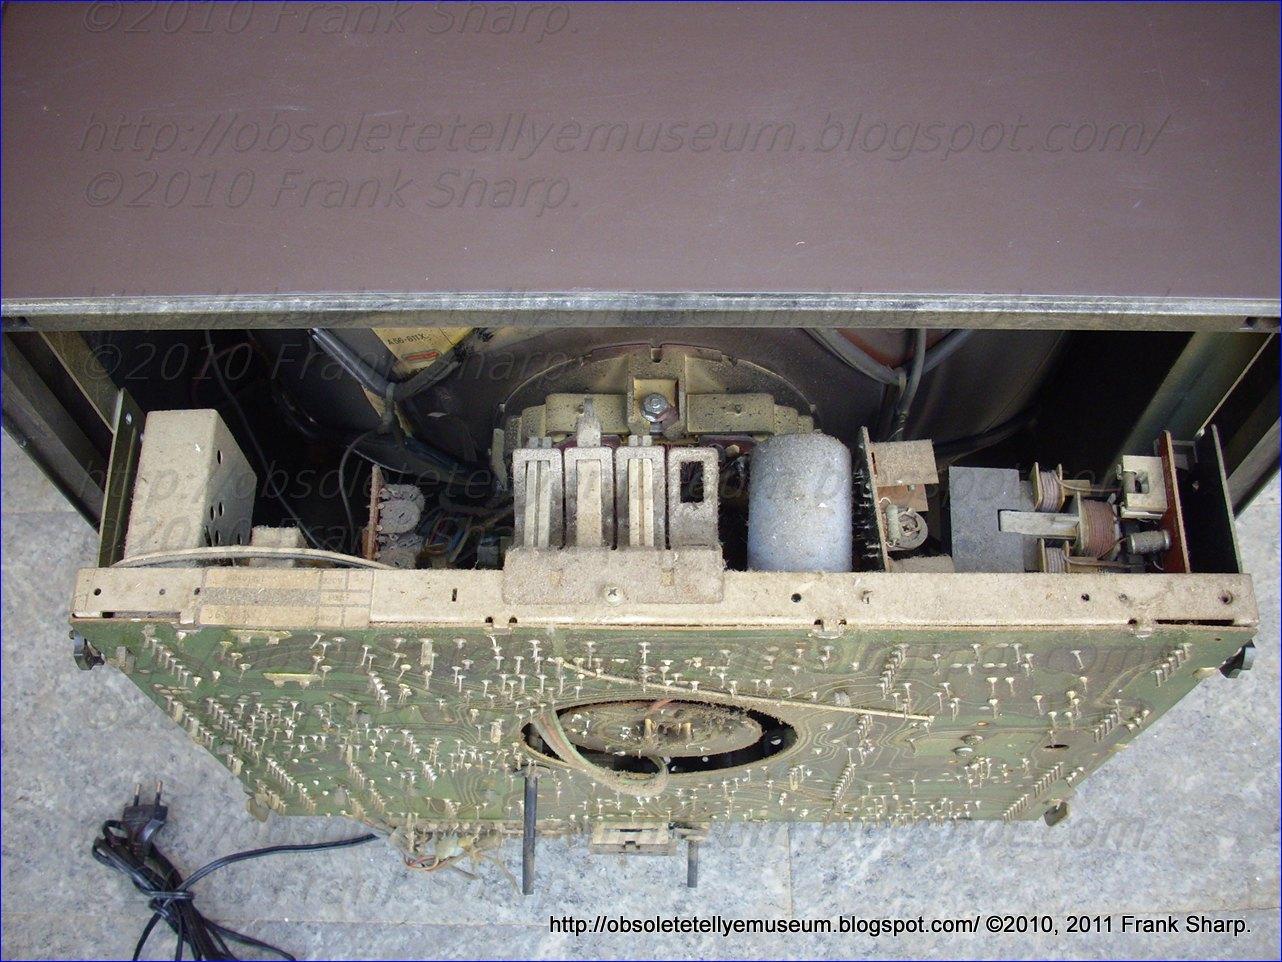 Obsolete Technology Tellye !: DUMONT (EMERSON) 22 TULSA 16 SE ...